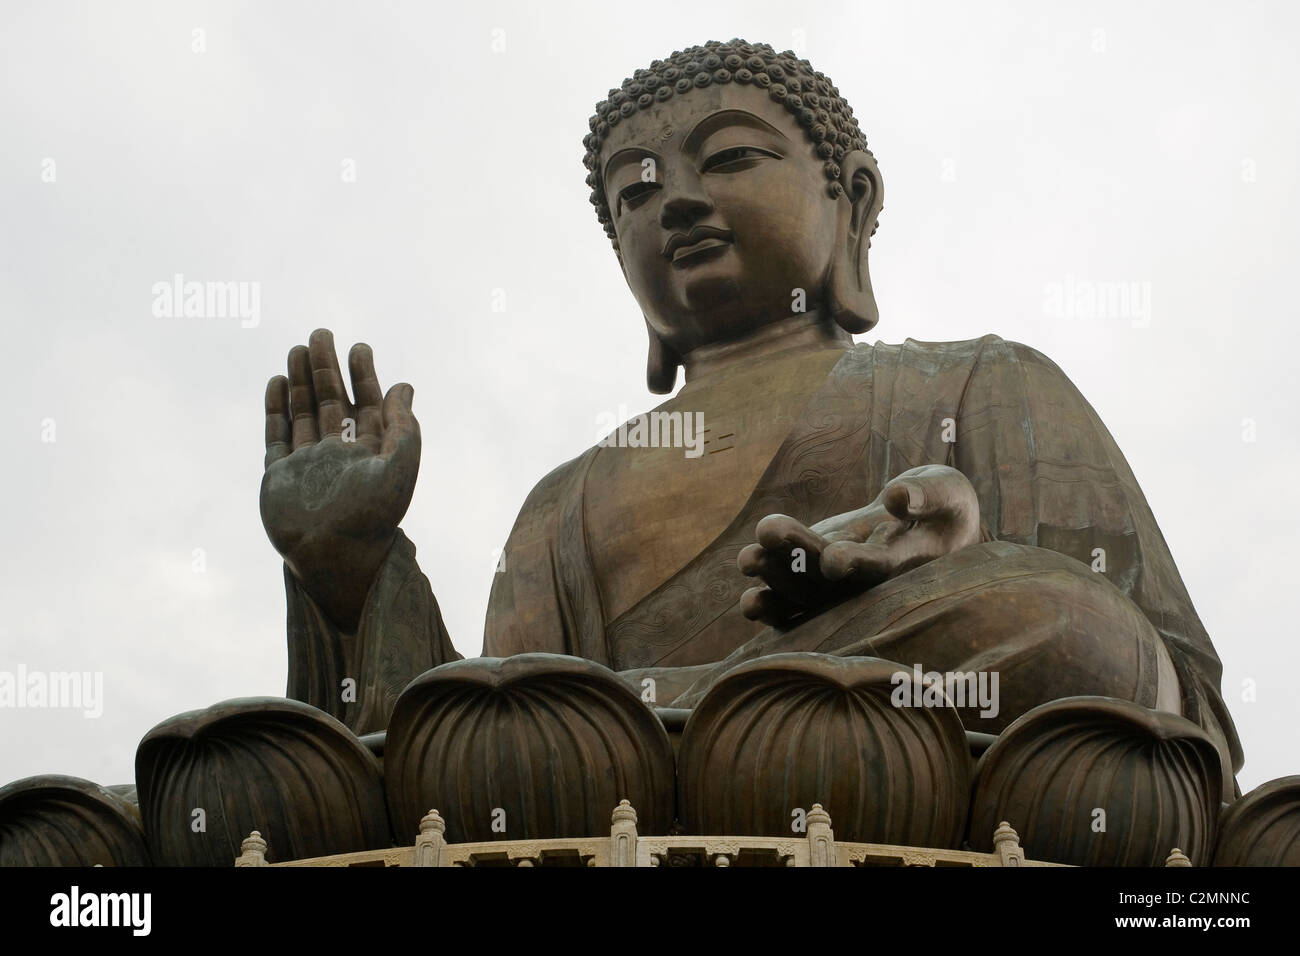 China Hong Kong, Lantau Tian Tan Buddha - Stock Image